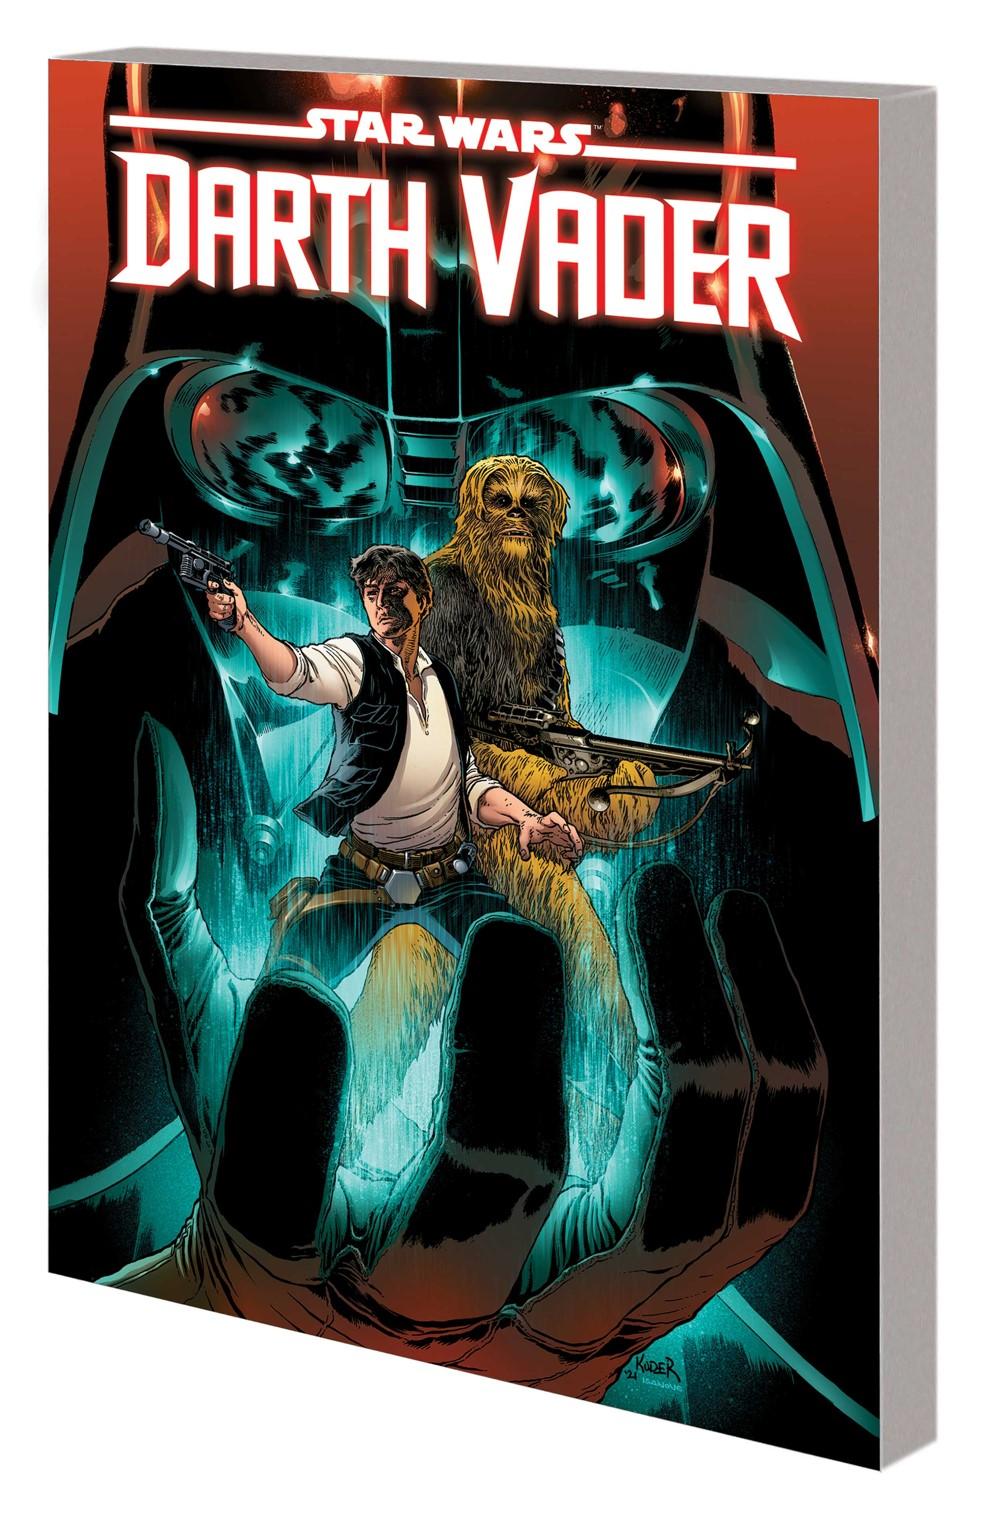 SW_DARTH_VADER_VOL_3_TPB Marvel Comics September 2021 Solicitations